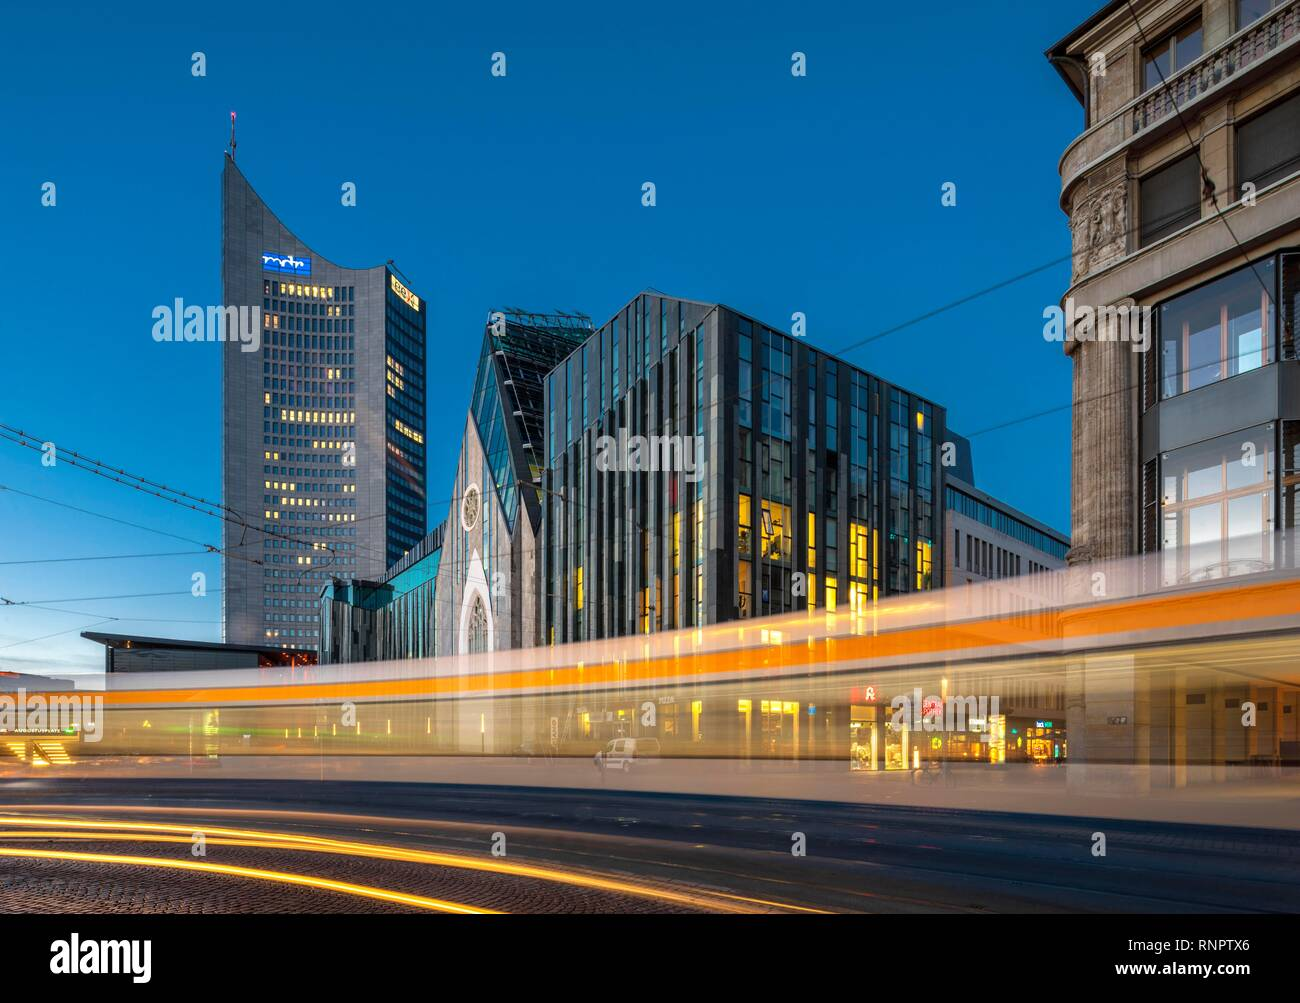 Augustusplatz with City Tower, University Buildings Augusteum and Paulinum, Tram Light Tracks, University of Leipzig, Saxony - Stock Image